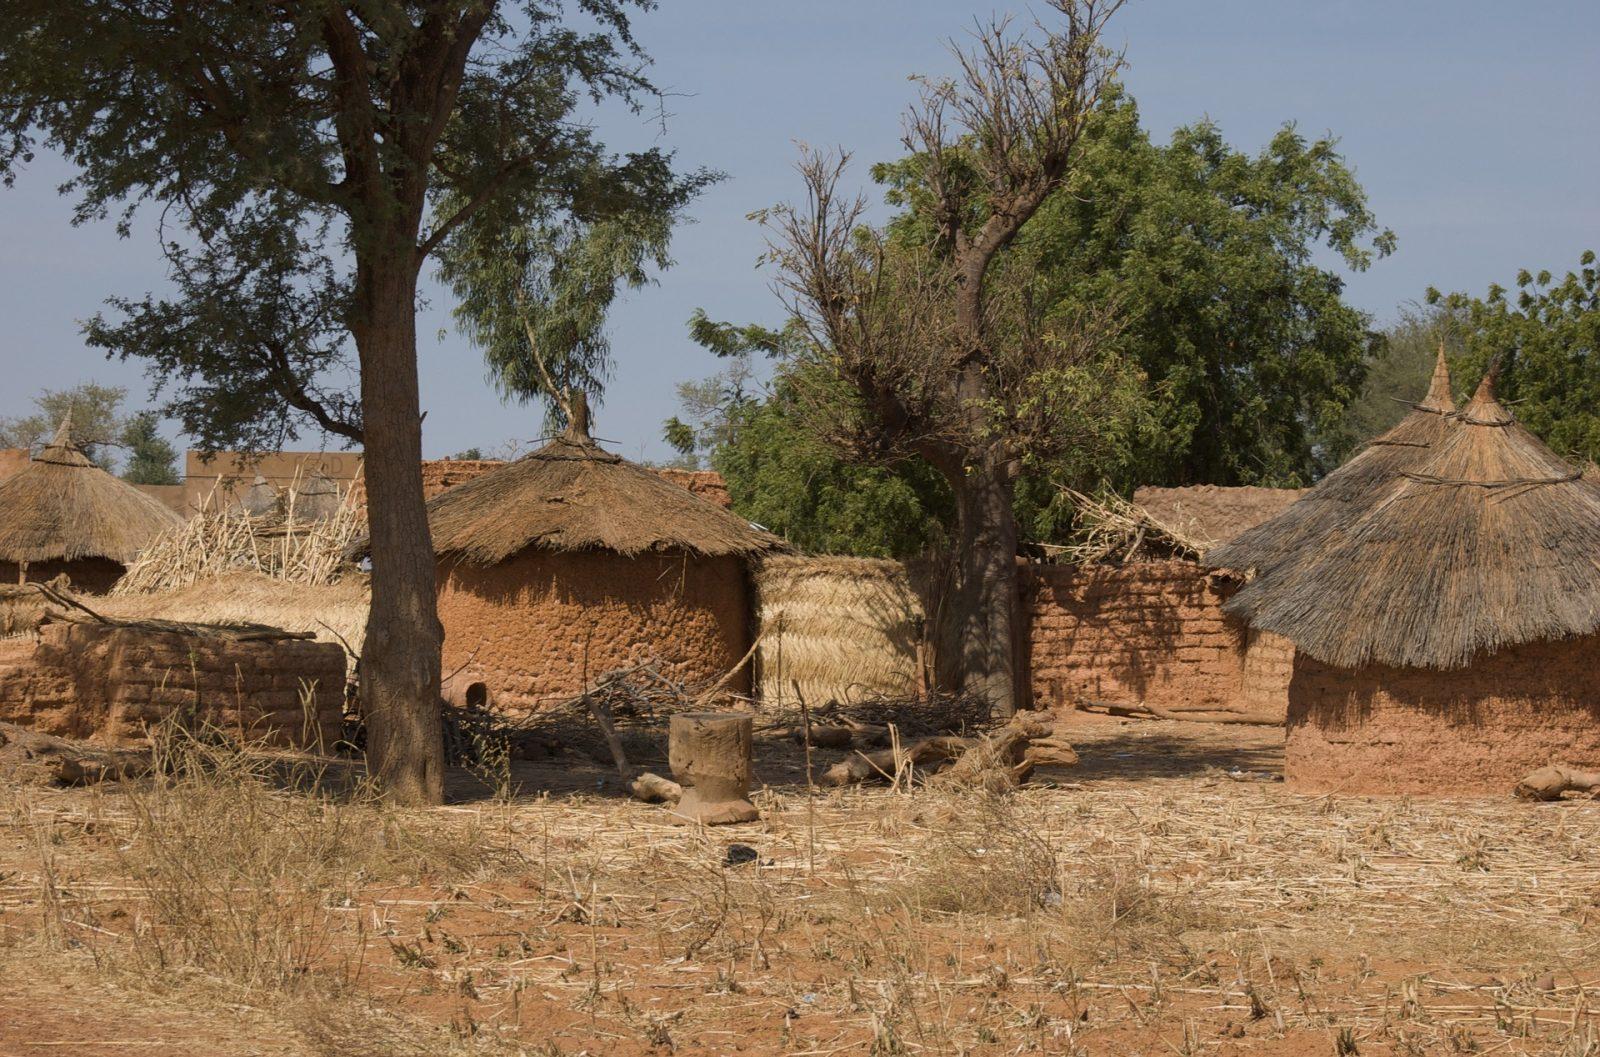 Burkina Faso Rural (Pixabay)